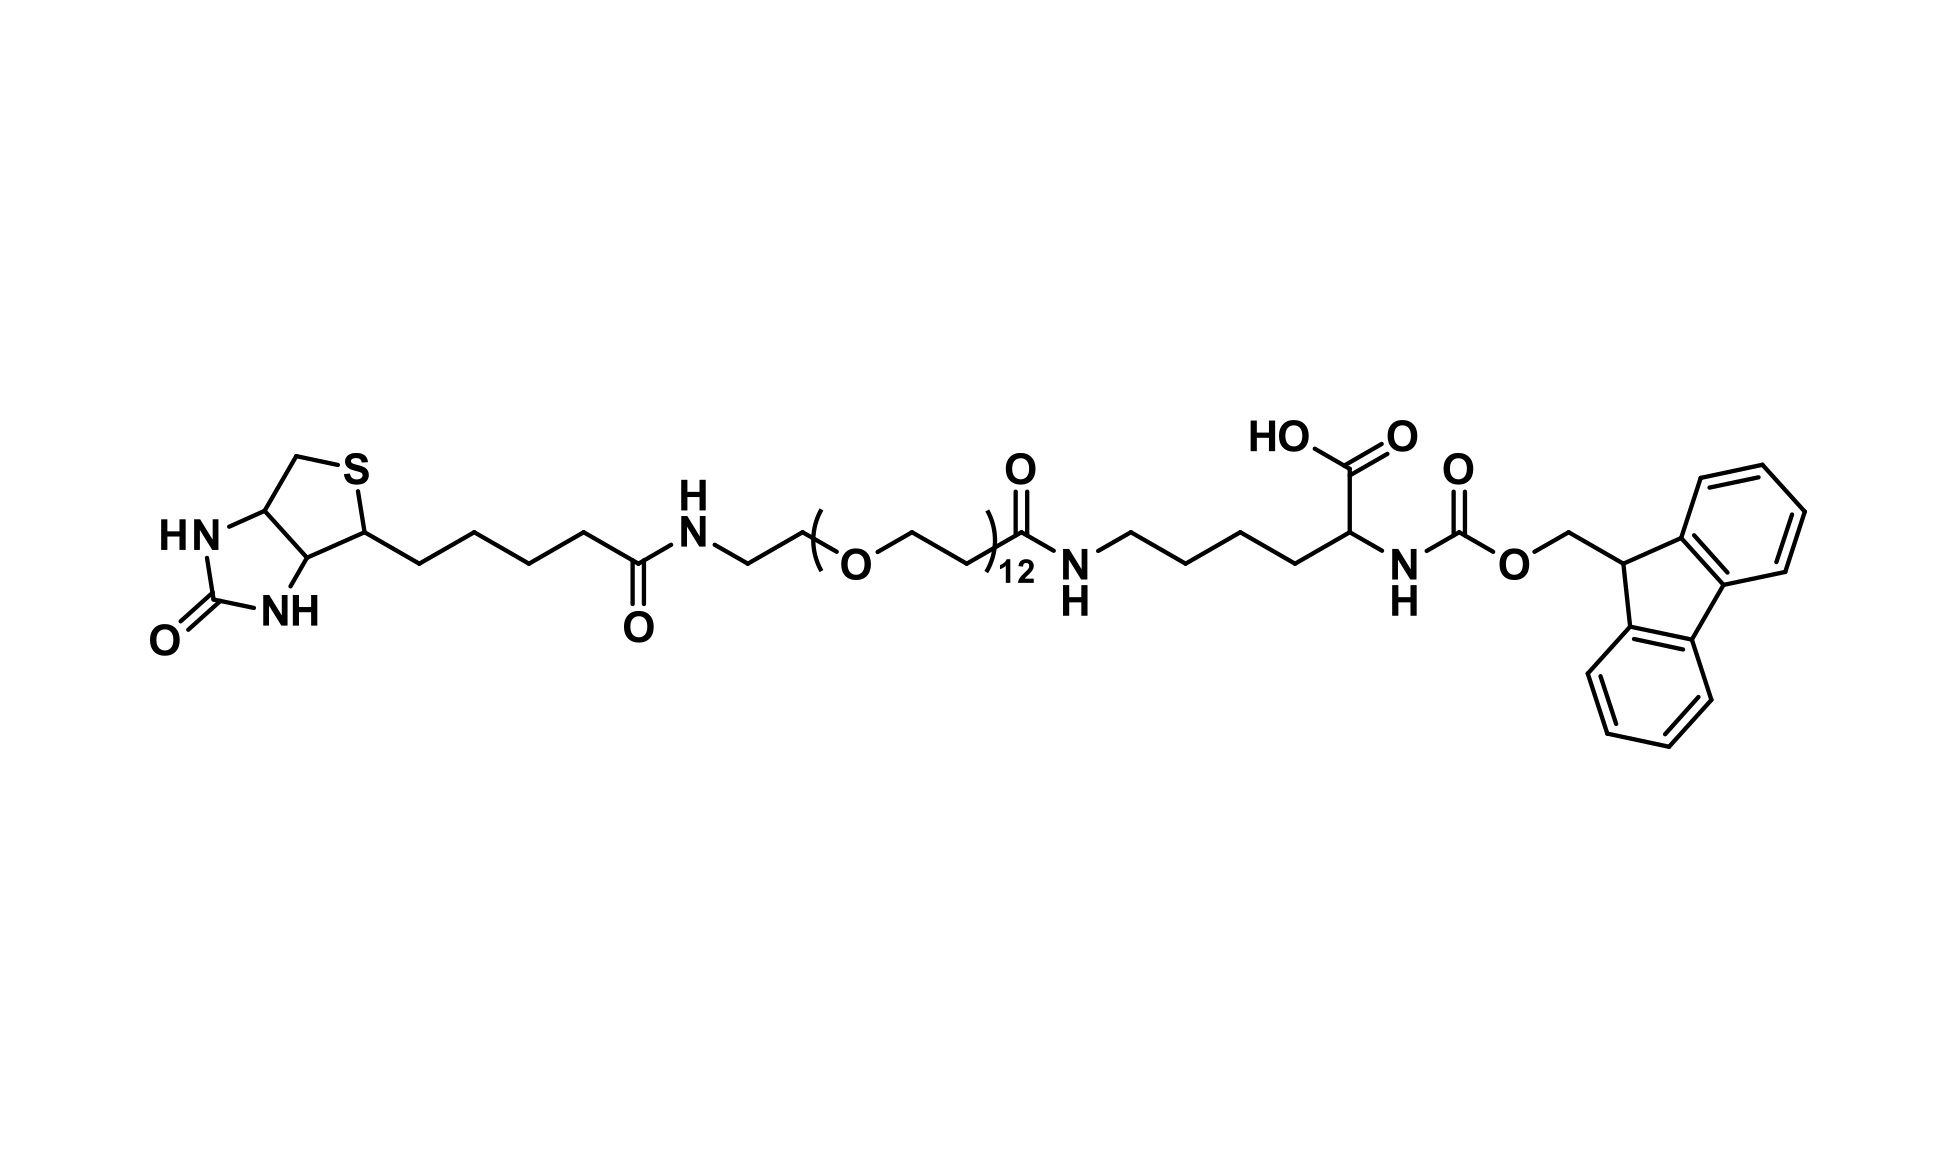 Fmoc-N-Lys-(dPEG®₁₂-biotin)-OH-(acid)